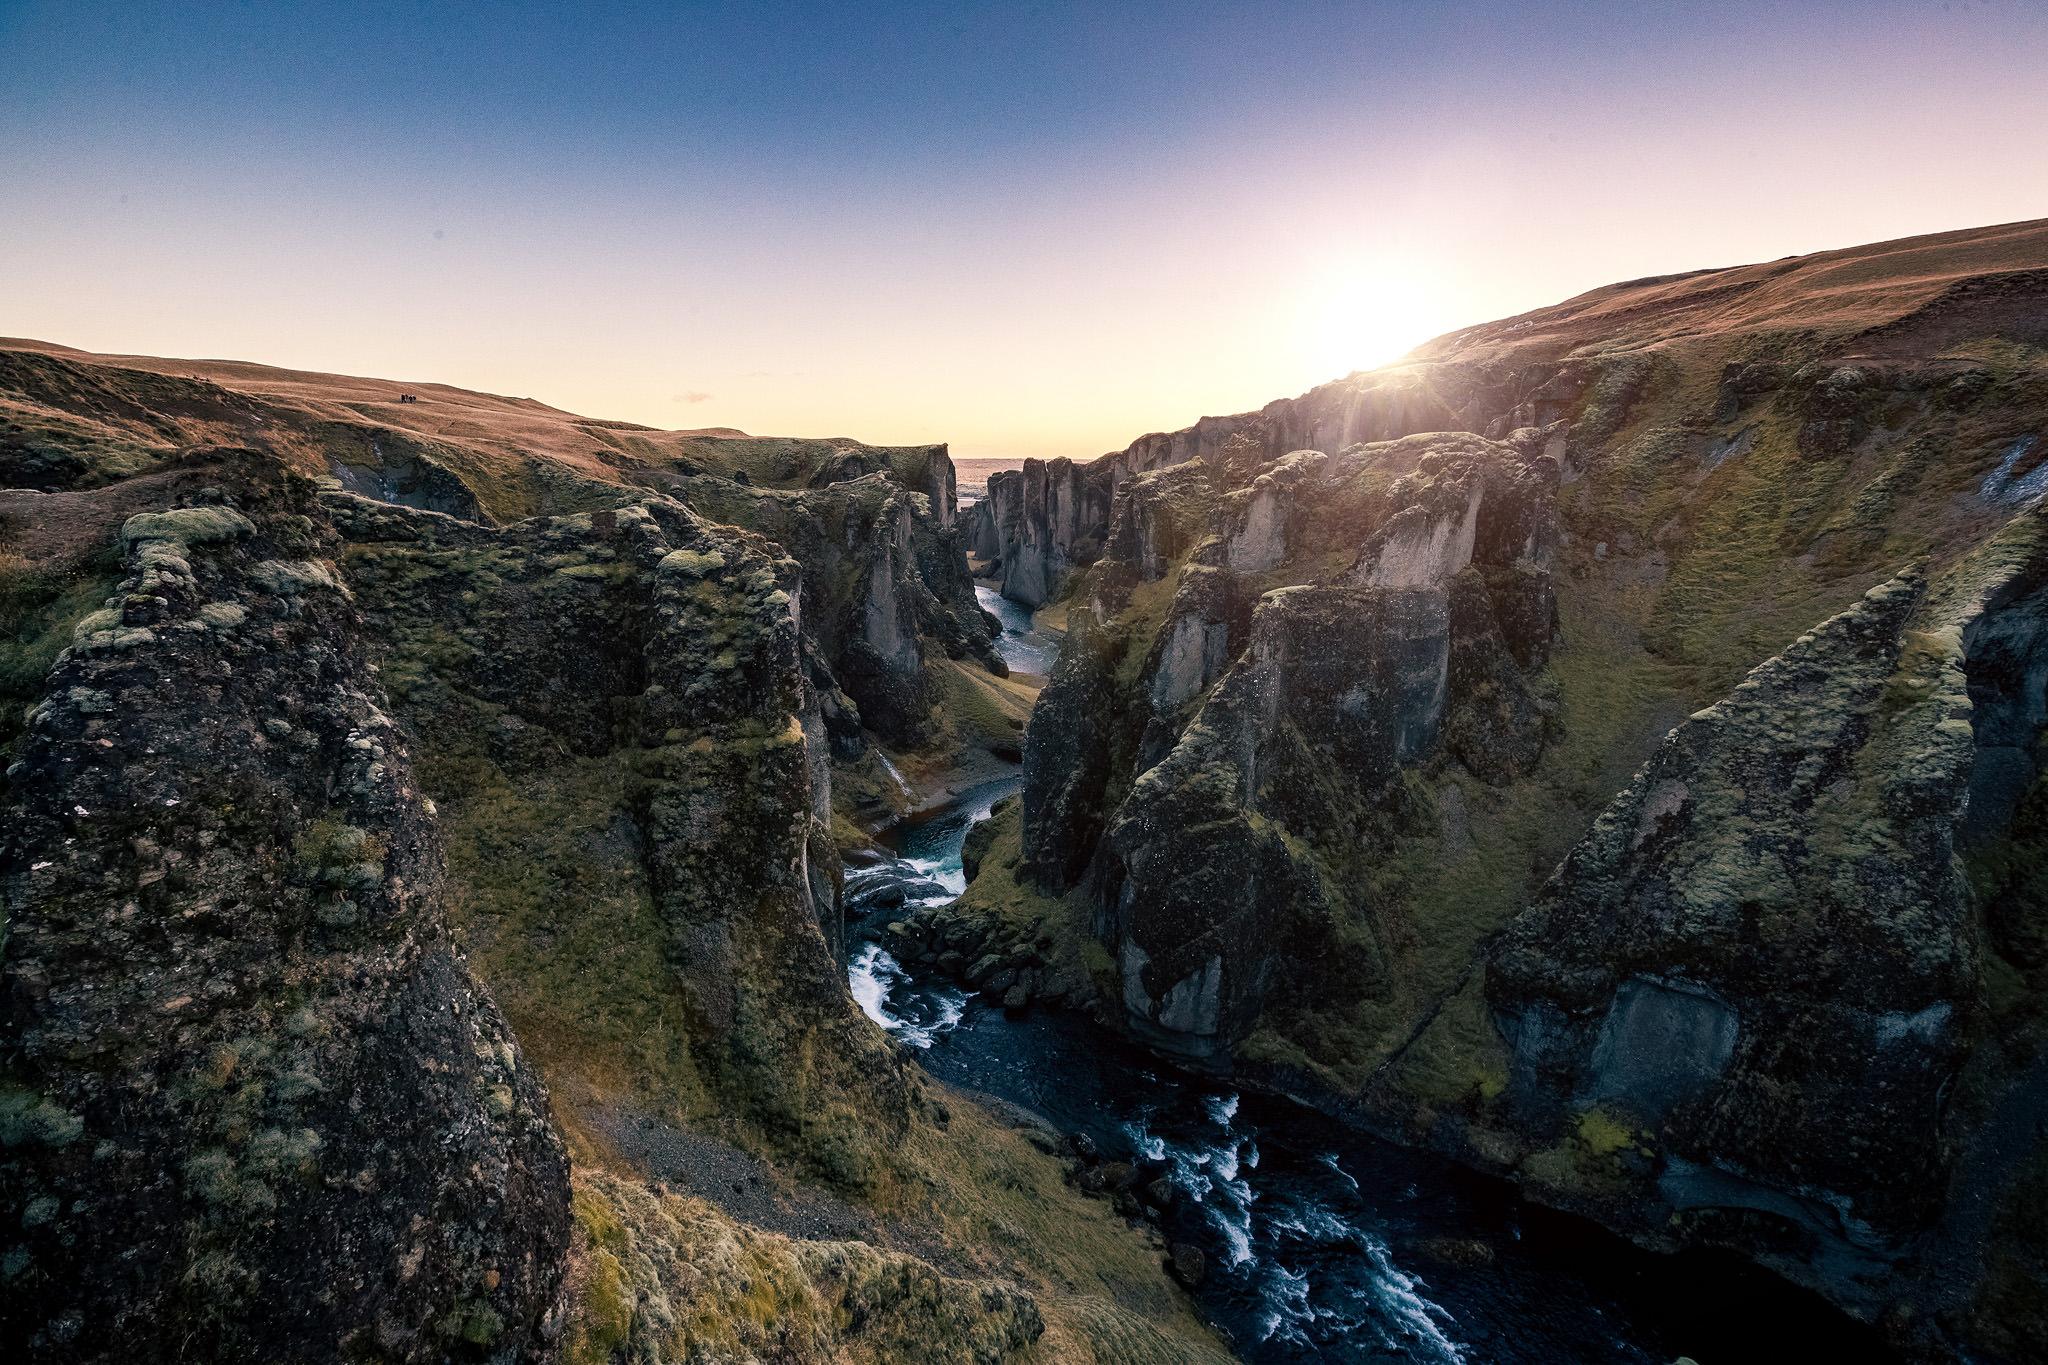 Sunset at Fjaðrárgljúfur-Canyon, Iceland